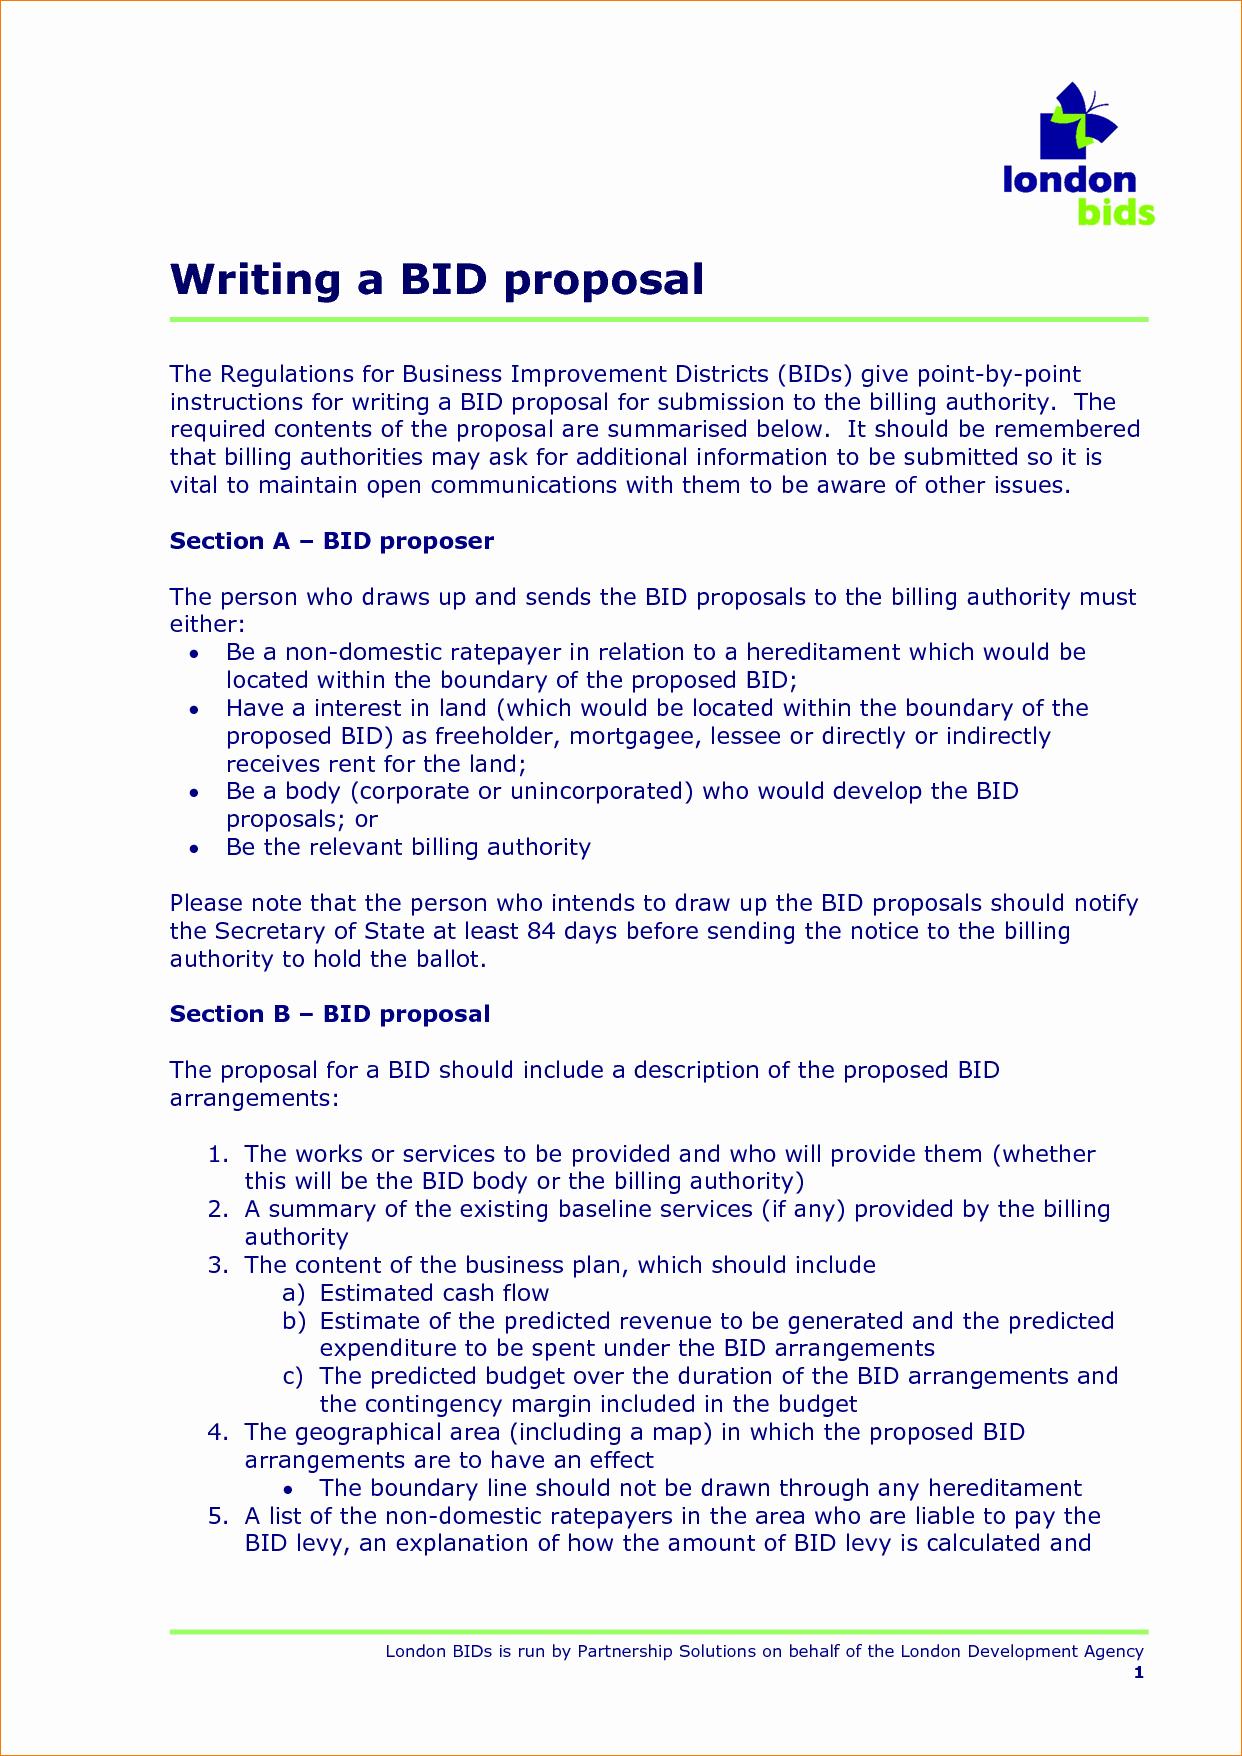 7 Bid Proposal Template